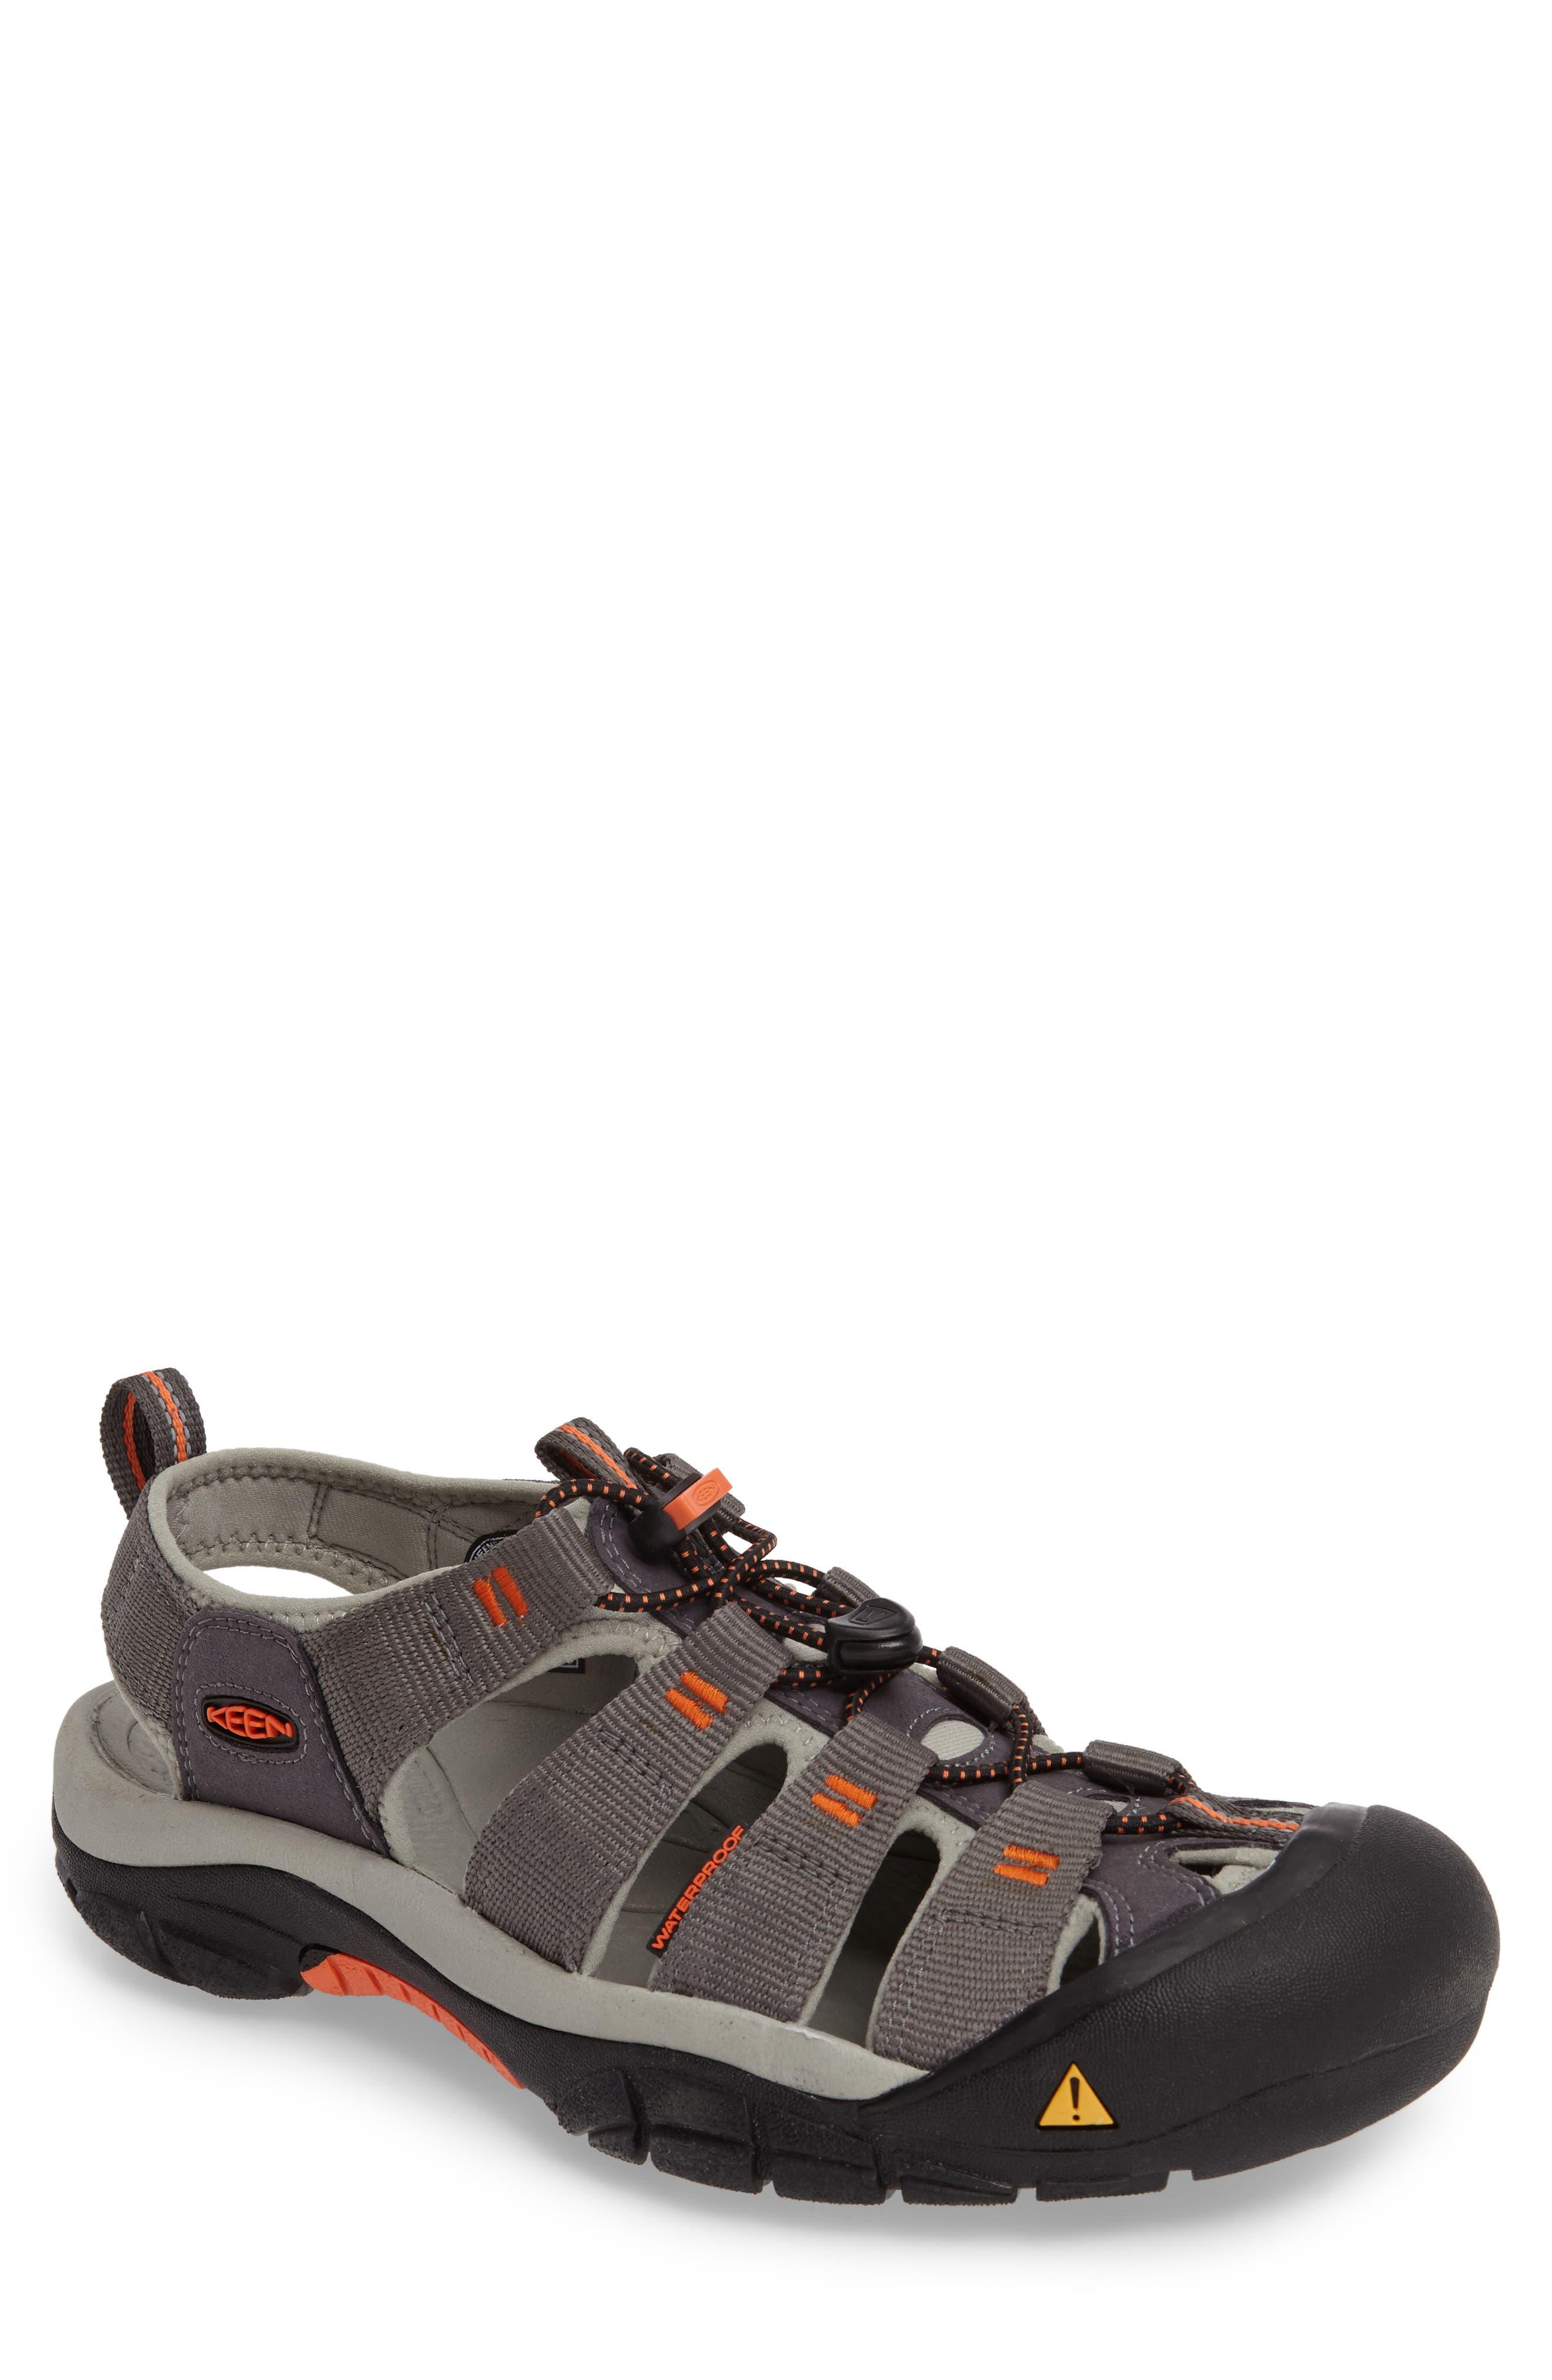 Alternate Image 1 Selected - Keen 'Newport H2' Sandal (Men)